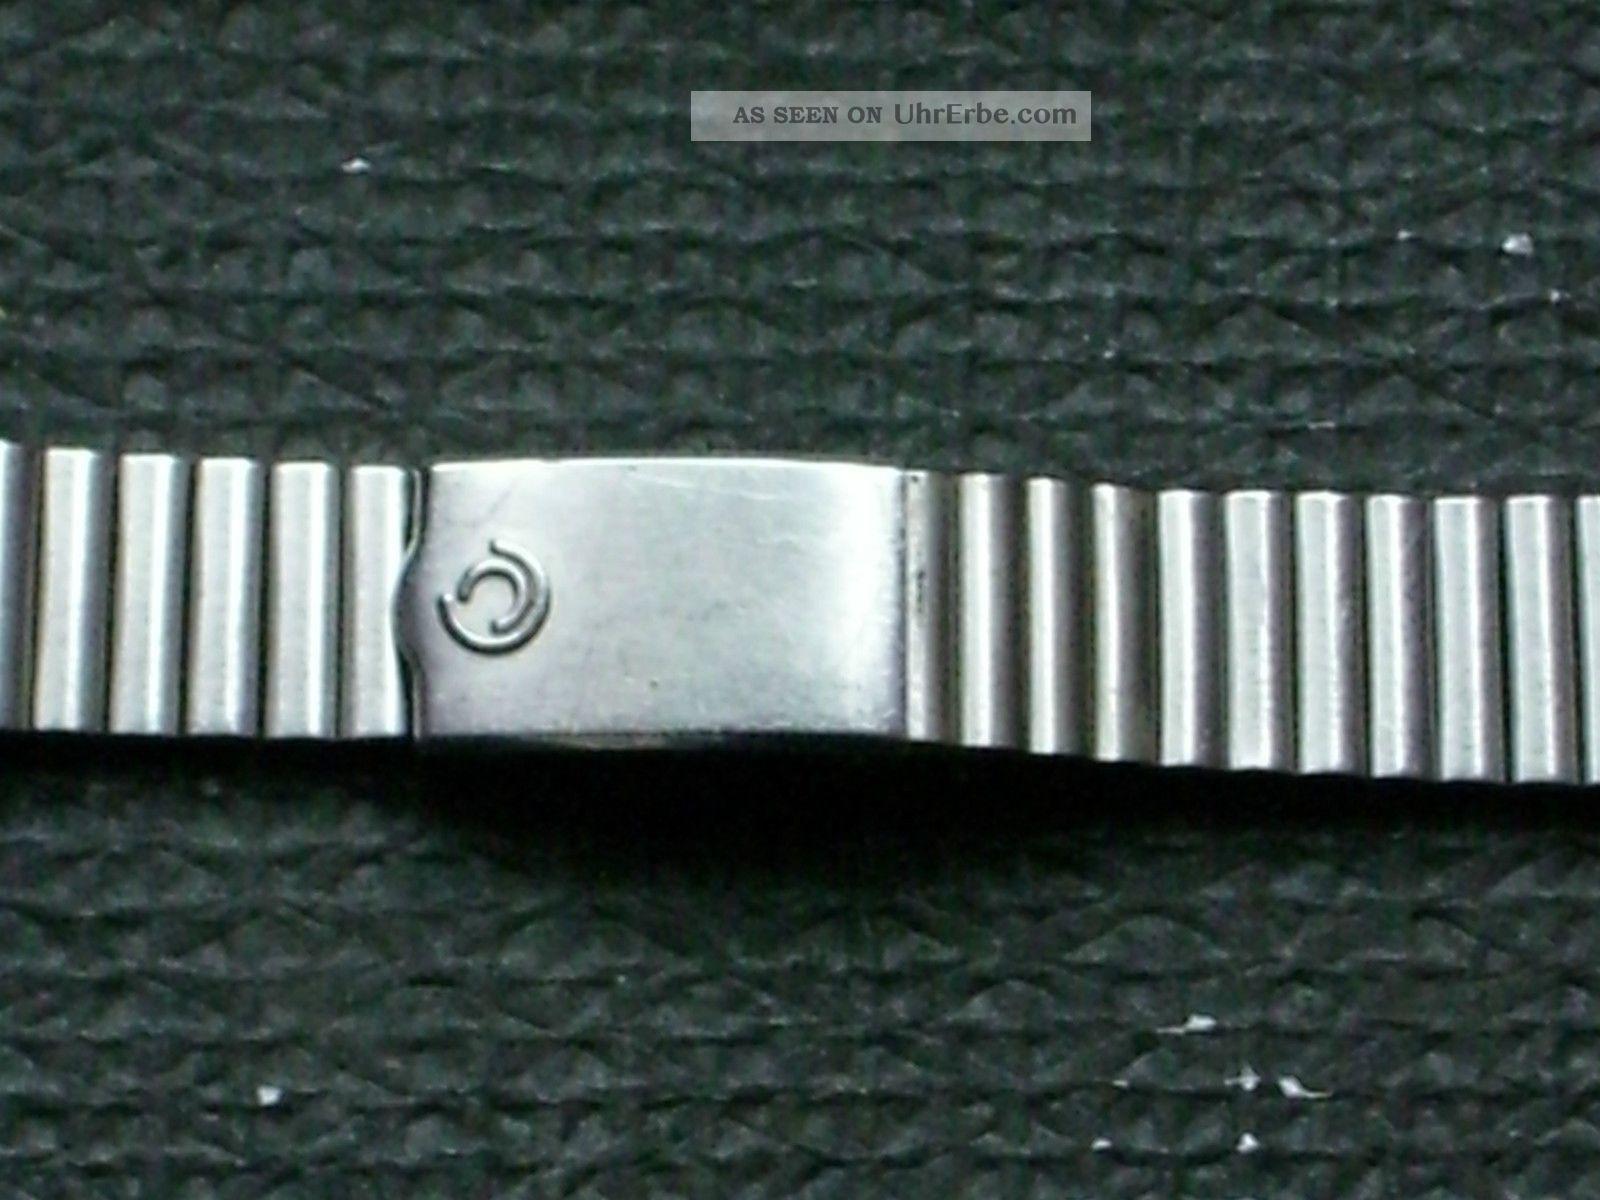 Seltenes Certina Armband Für Herrenuhr,  Herrenarmbanduhr 19er Anstoß, Armbanduhren Bild